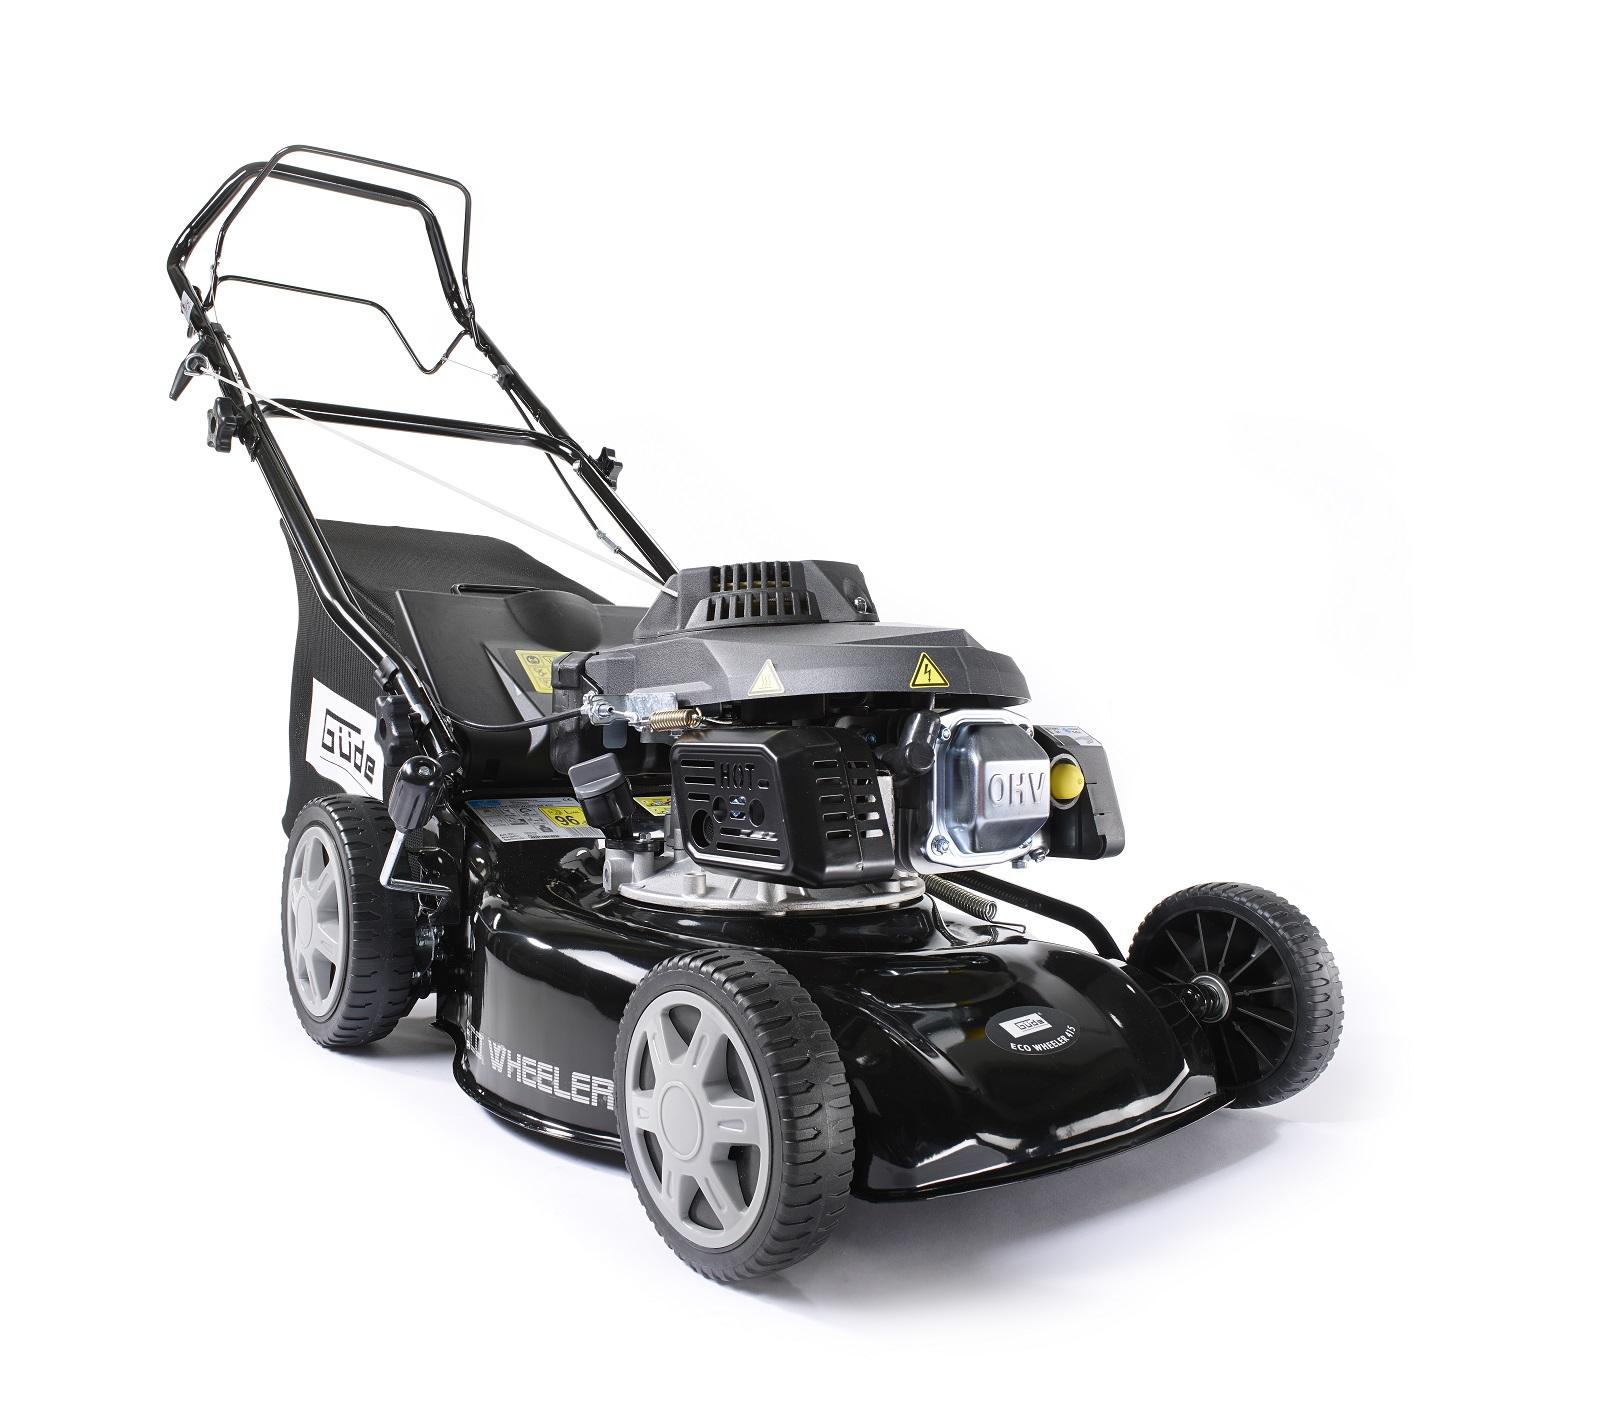 g de eco wheeler 415 benzin rasenm her radantrieb rasen garten selbstfahrer ebay. Black Bedroom Furniture Sets. Home Design Ideas